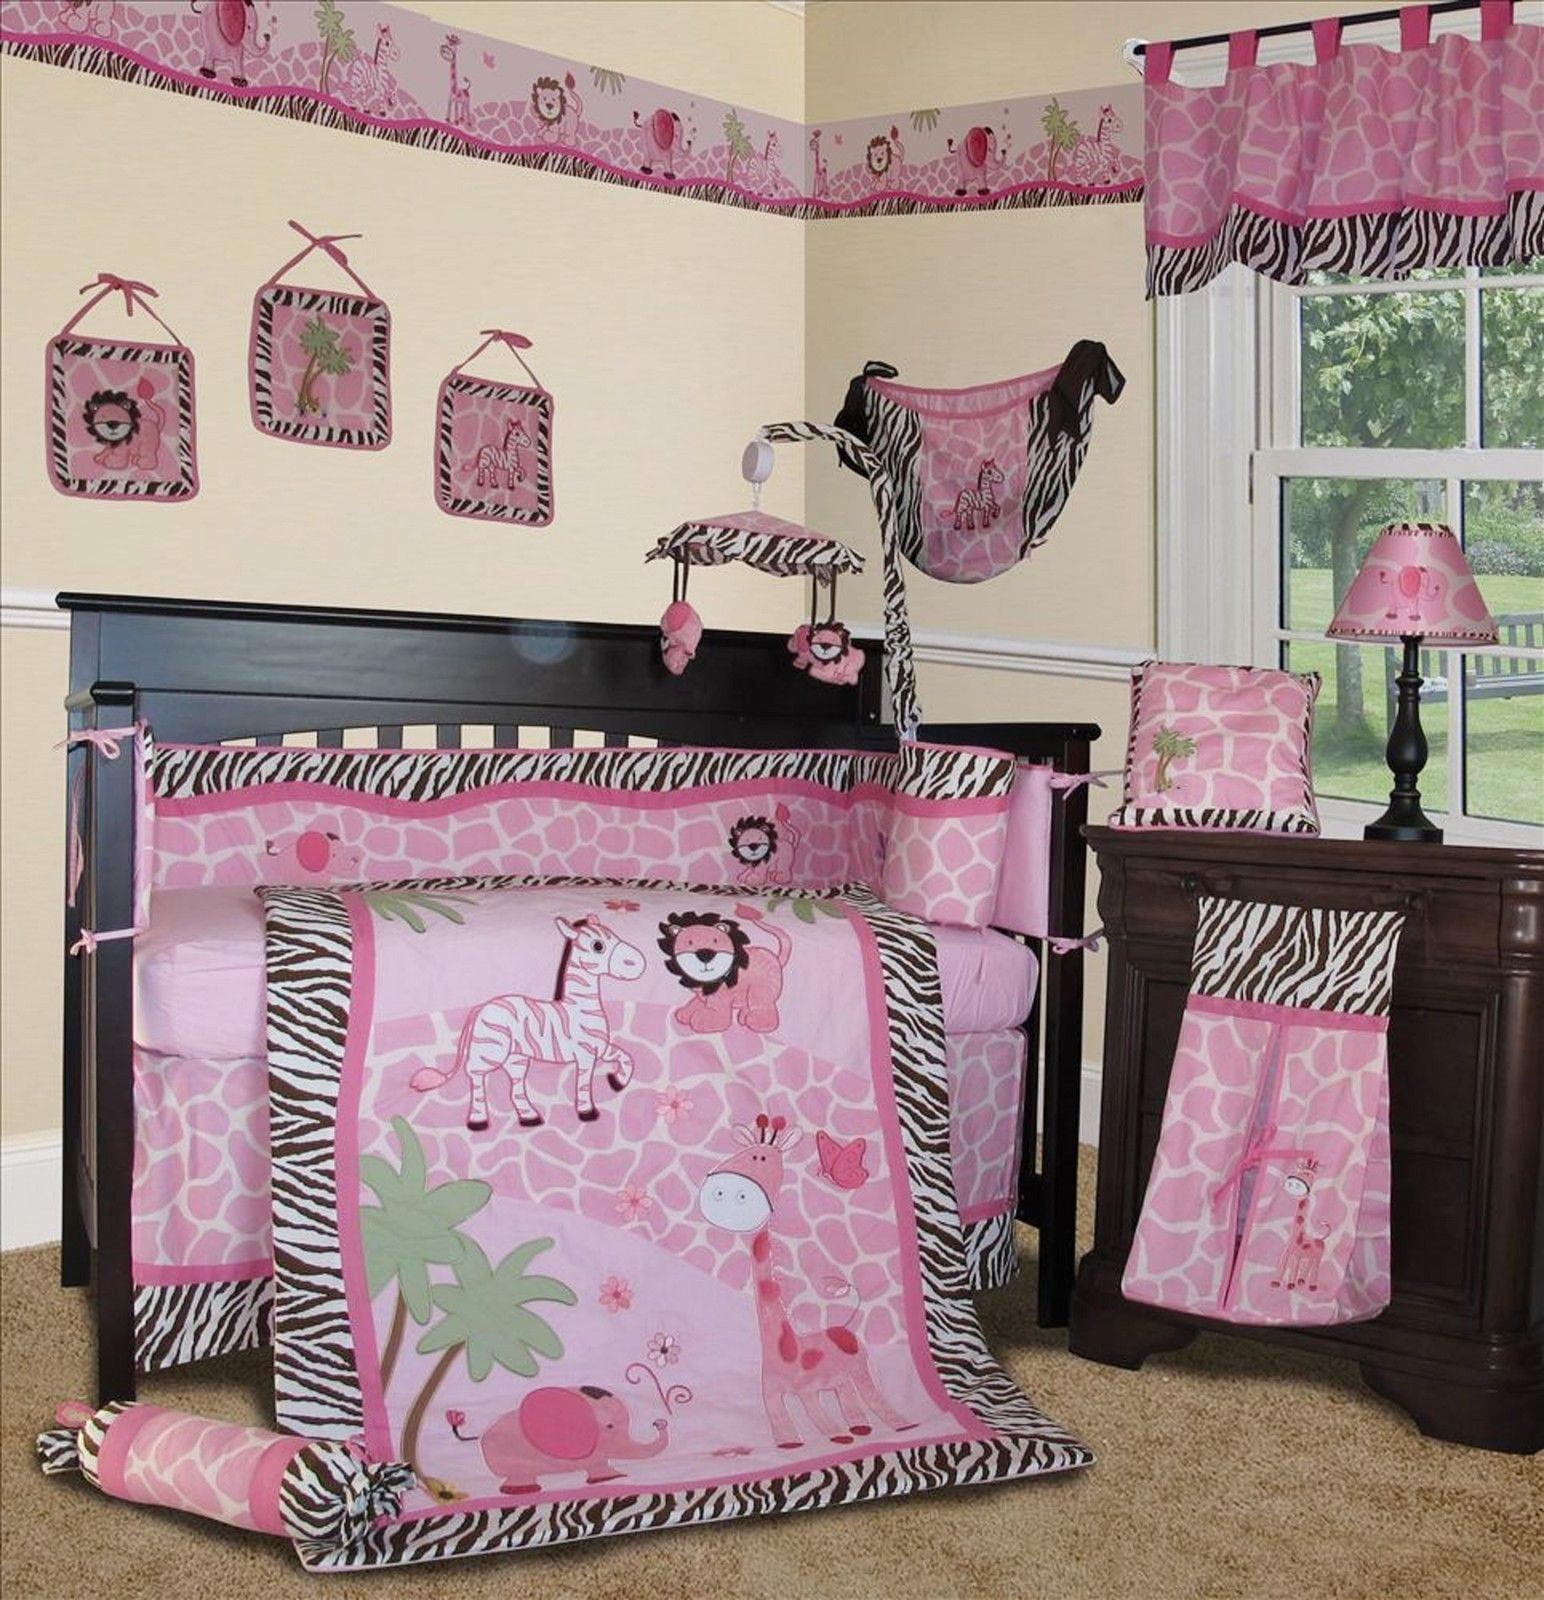 Sisi Baby Bedding Jungle Animal Crib Nursery Bedding Set 13 Pieces by Sisi